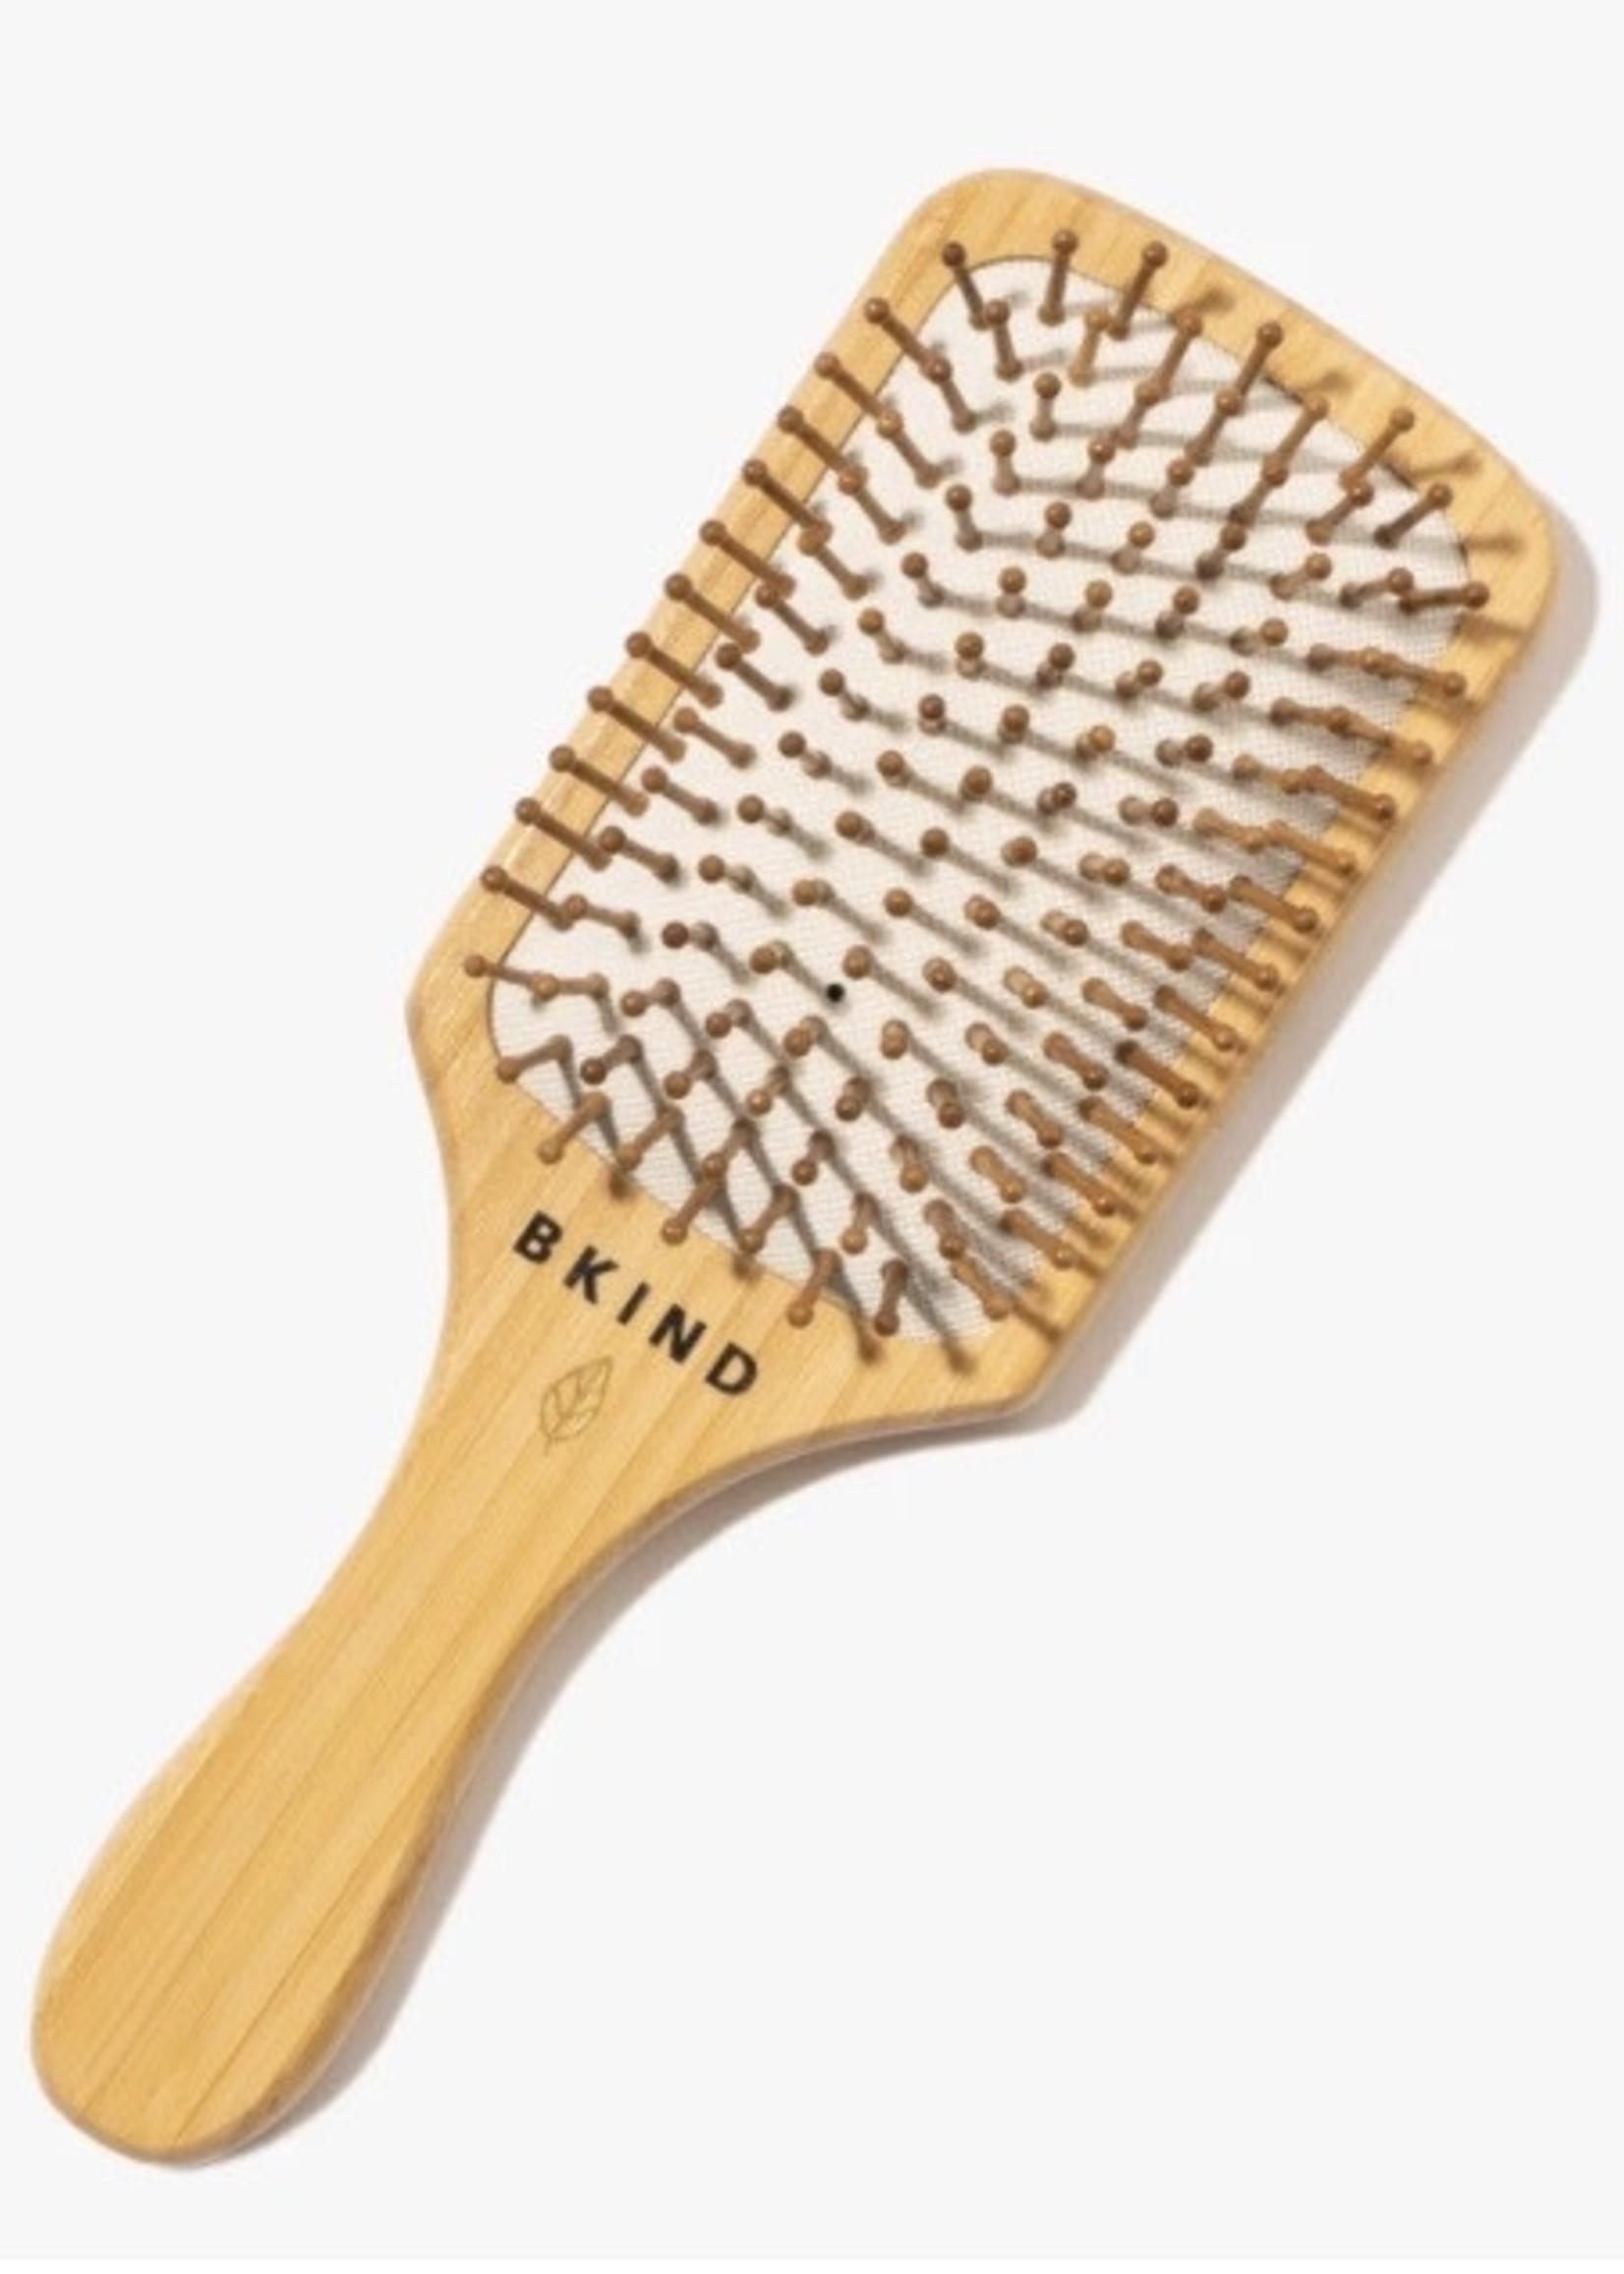 BKIND Bamboo Hair Brush